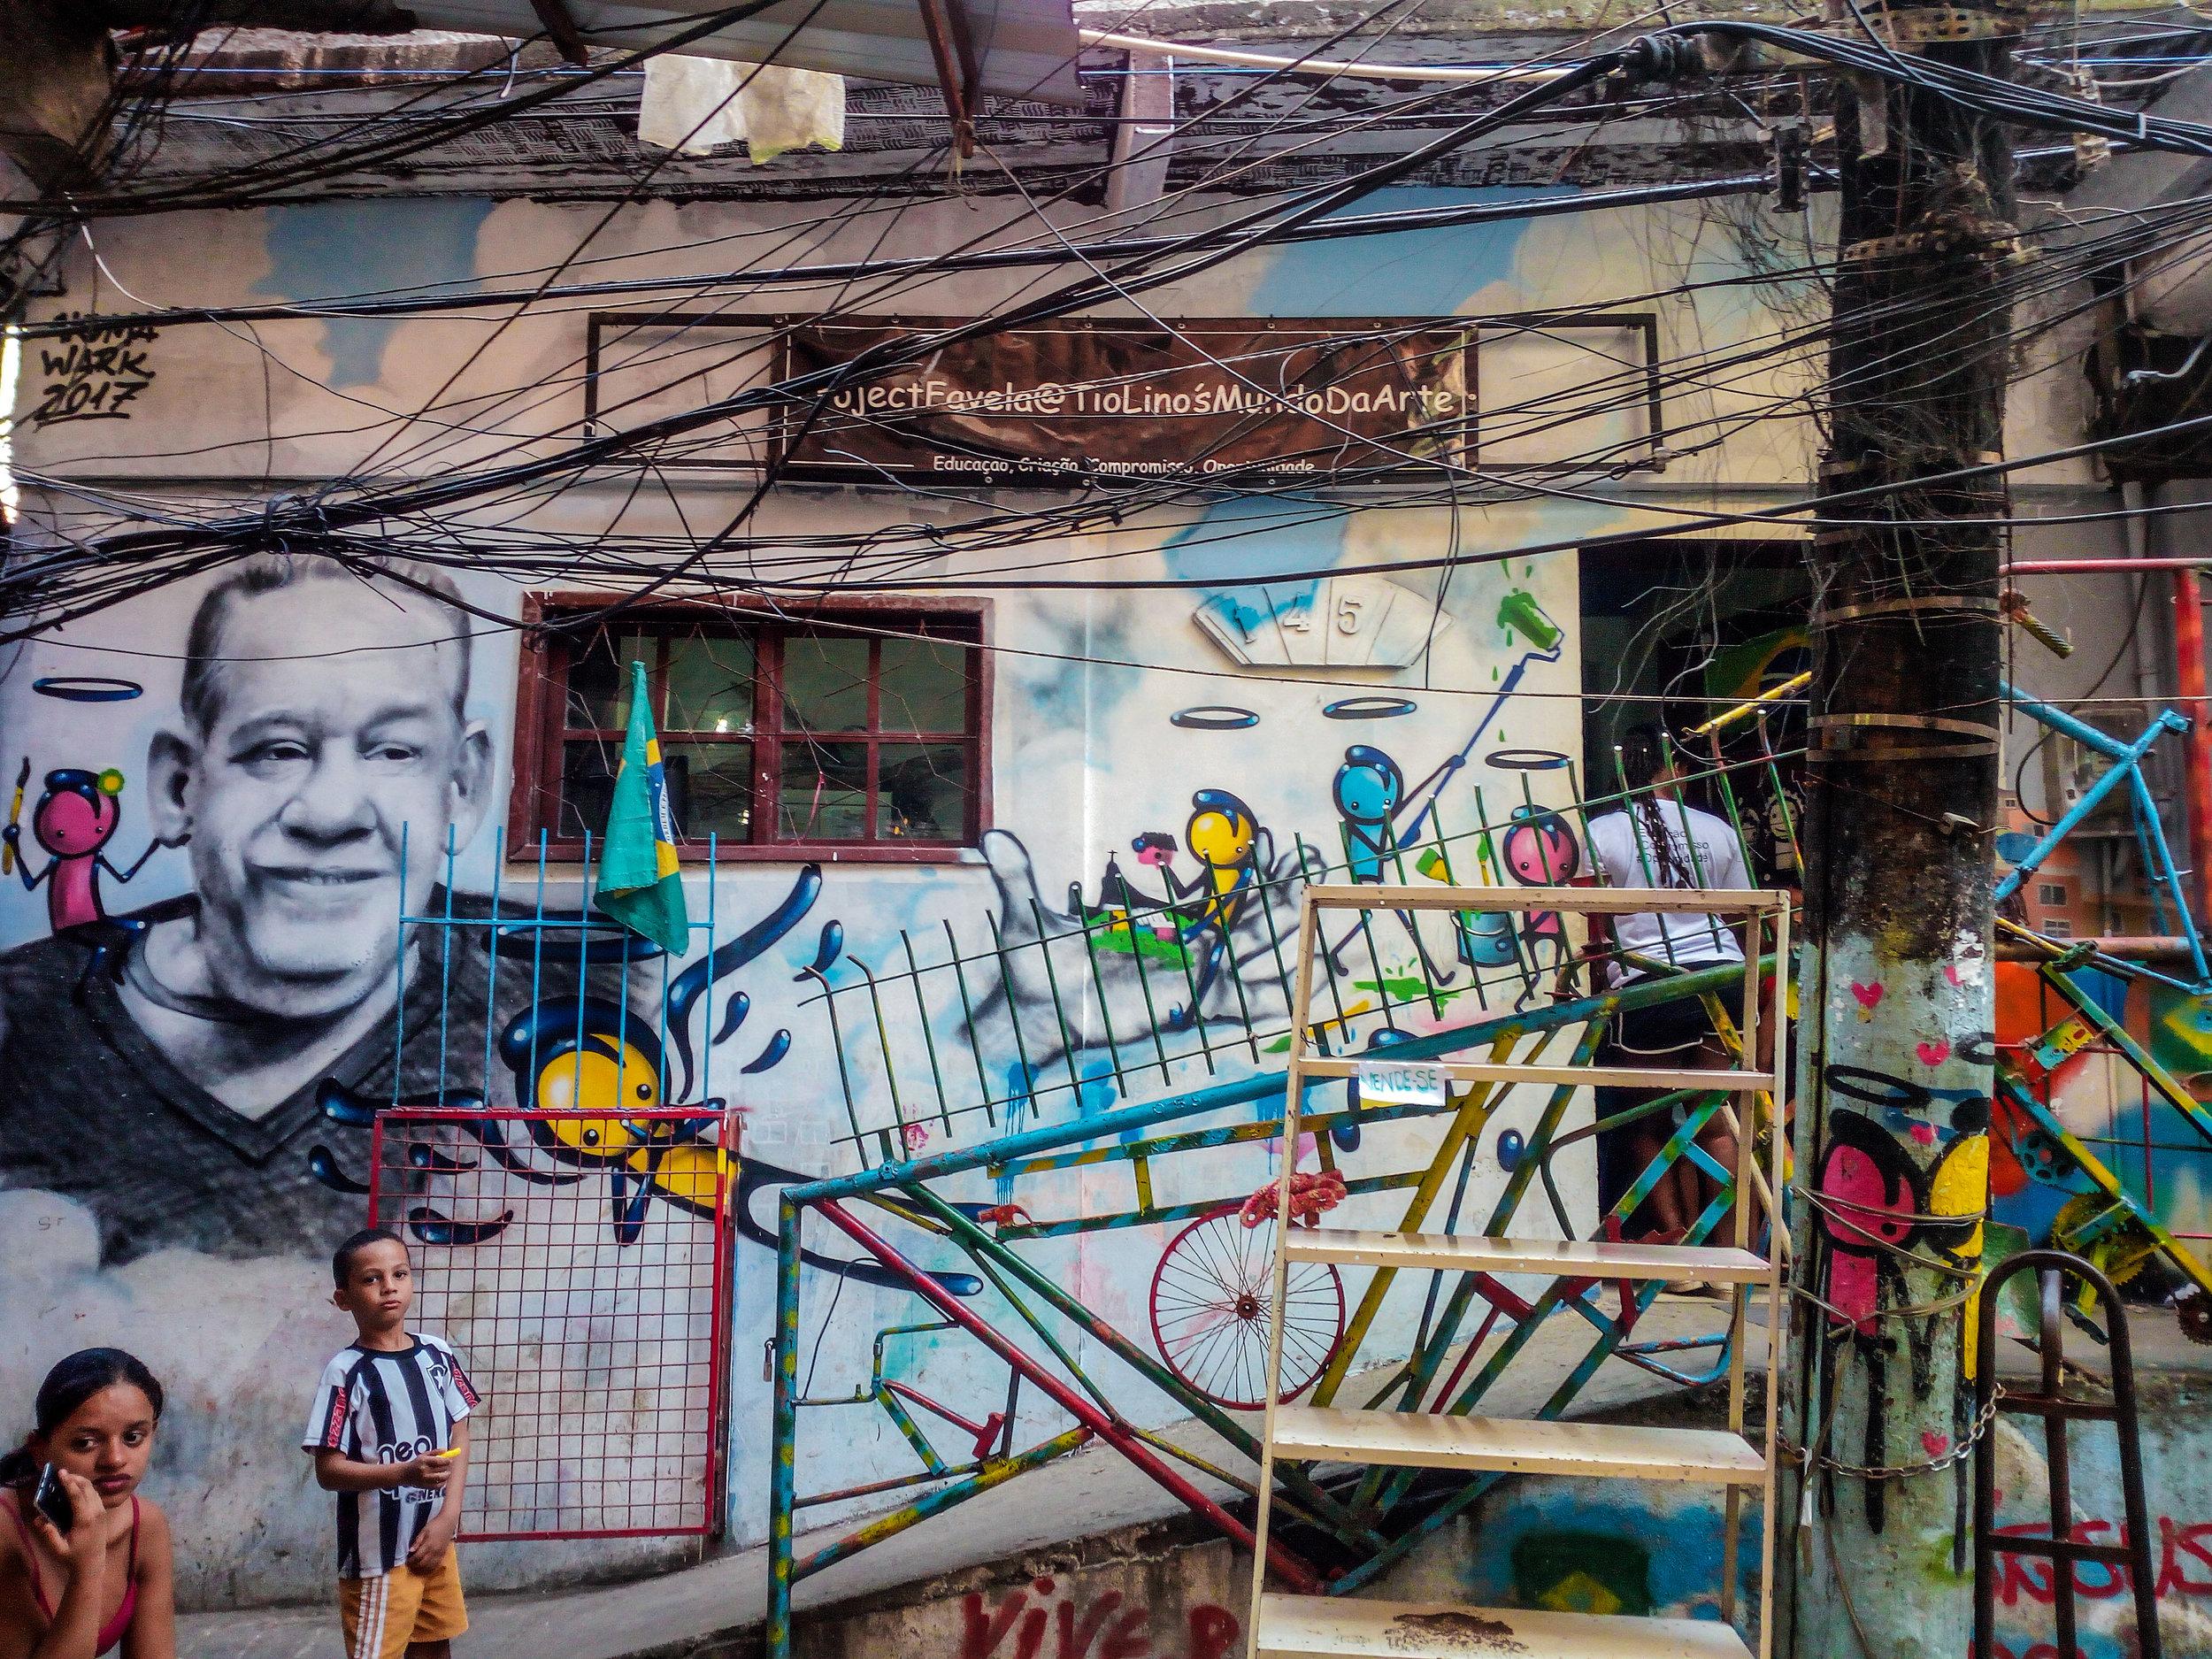 Welcome to Project Favela, photo by Franziska Kleinhempl.